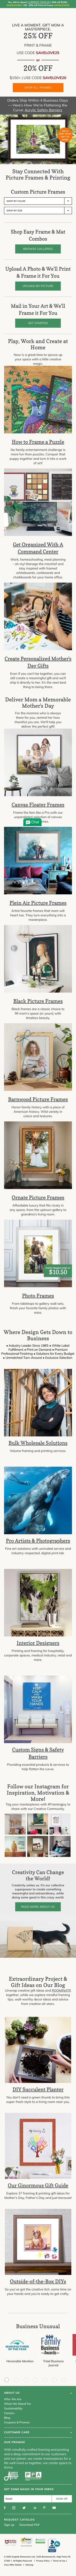 Pictureframes.com Coupon